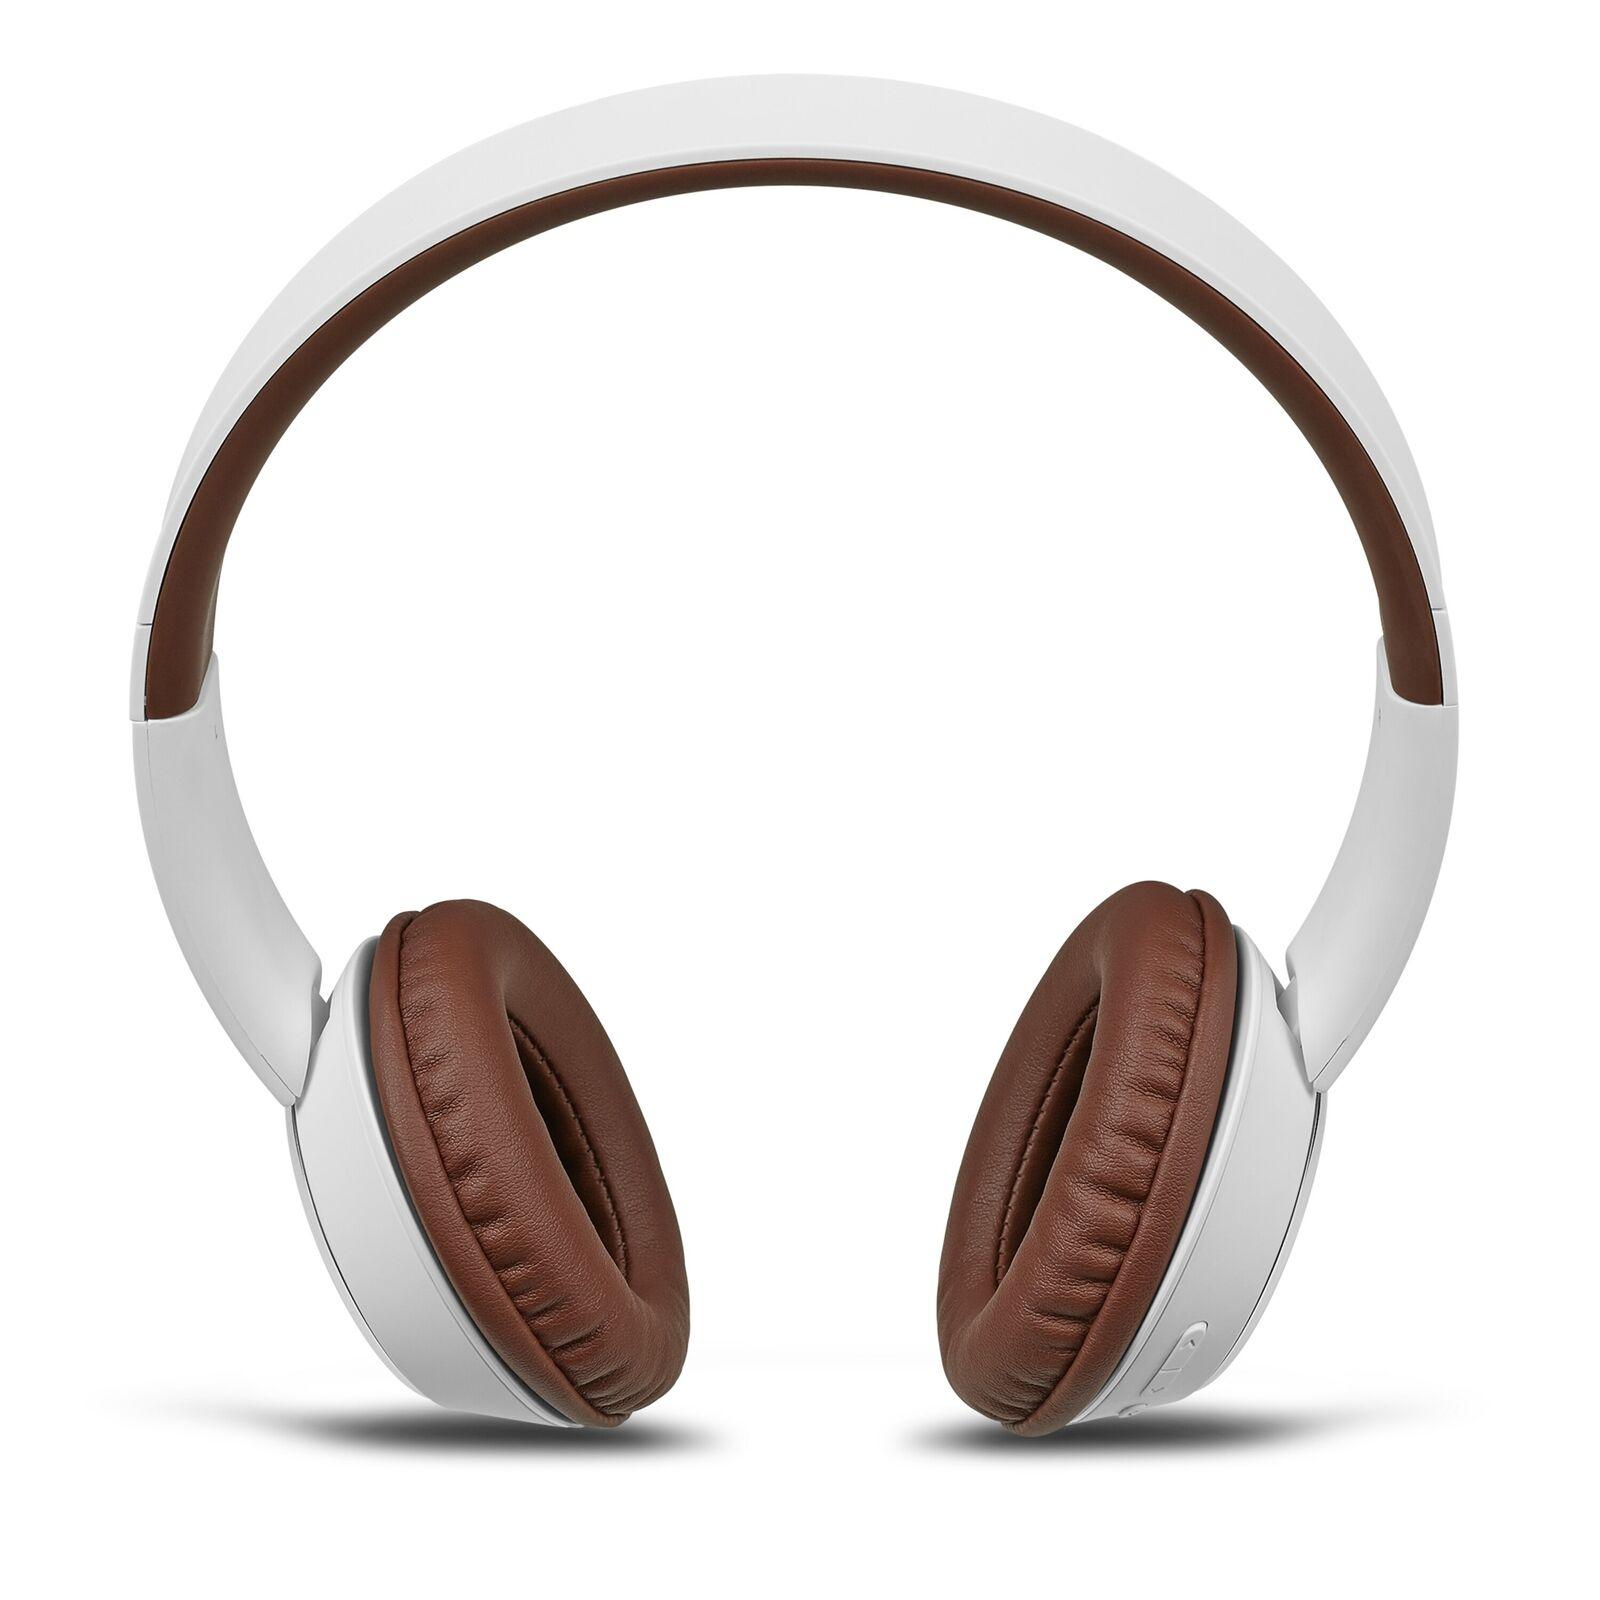 MEDION LIFE E62380 Bluetooth Kopfhörer Kabelloses Headset Over Ear Stereo weiß